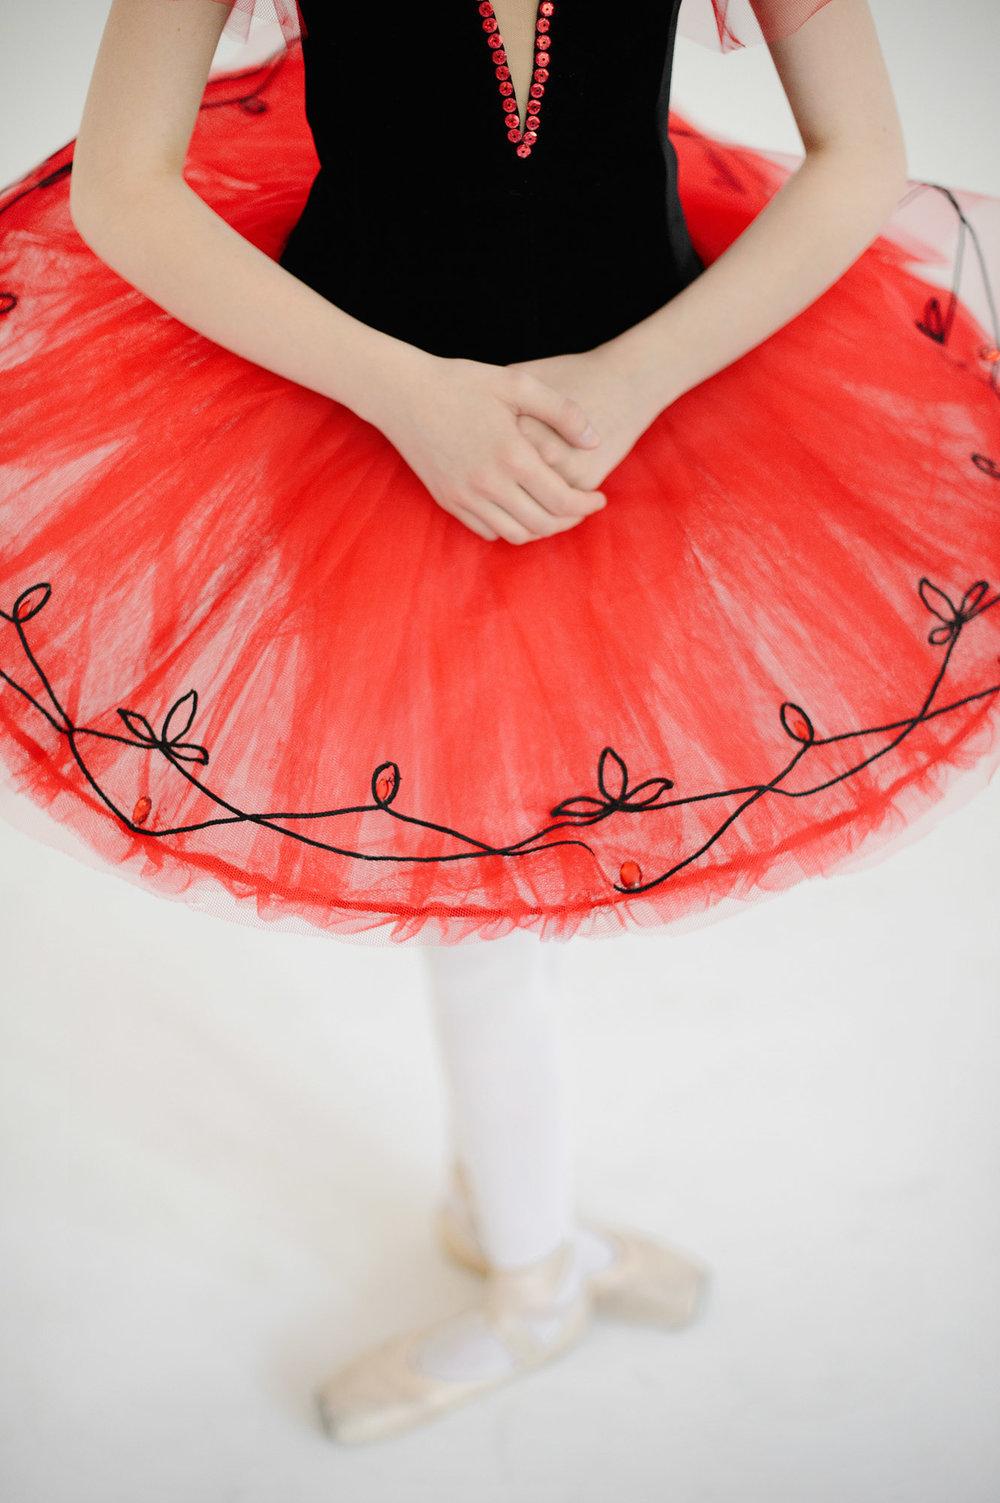 Cro&KowStudio_ballerina6.jpg